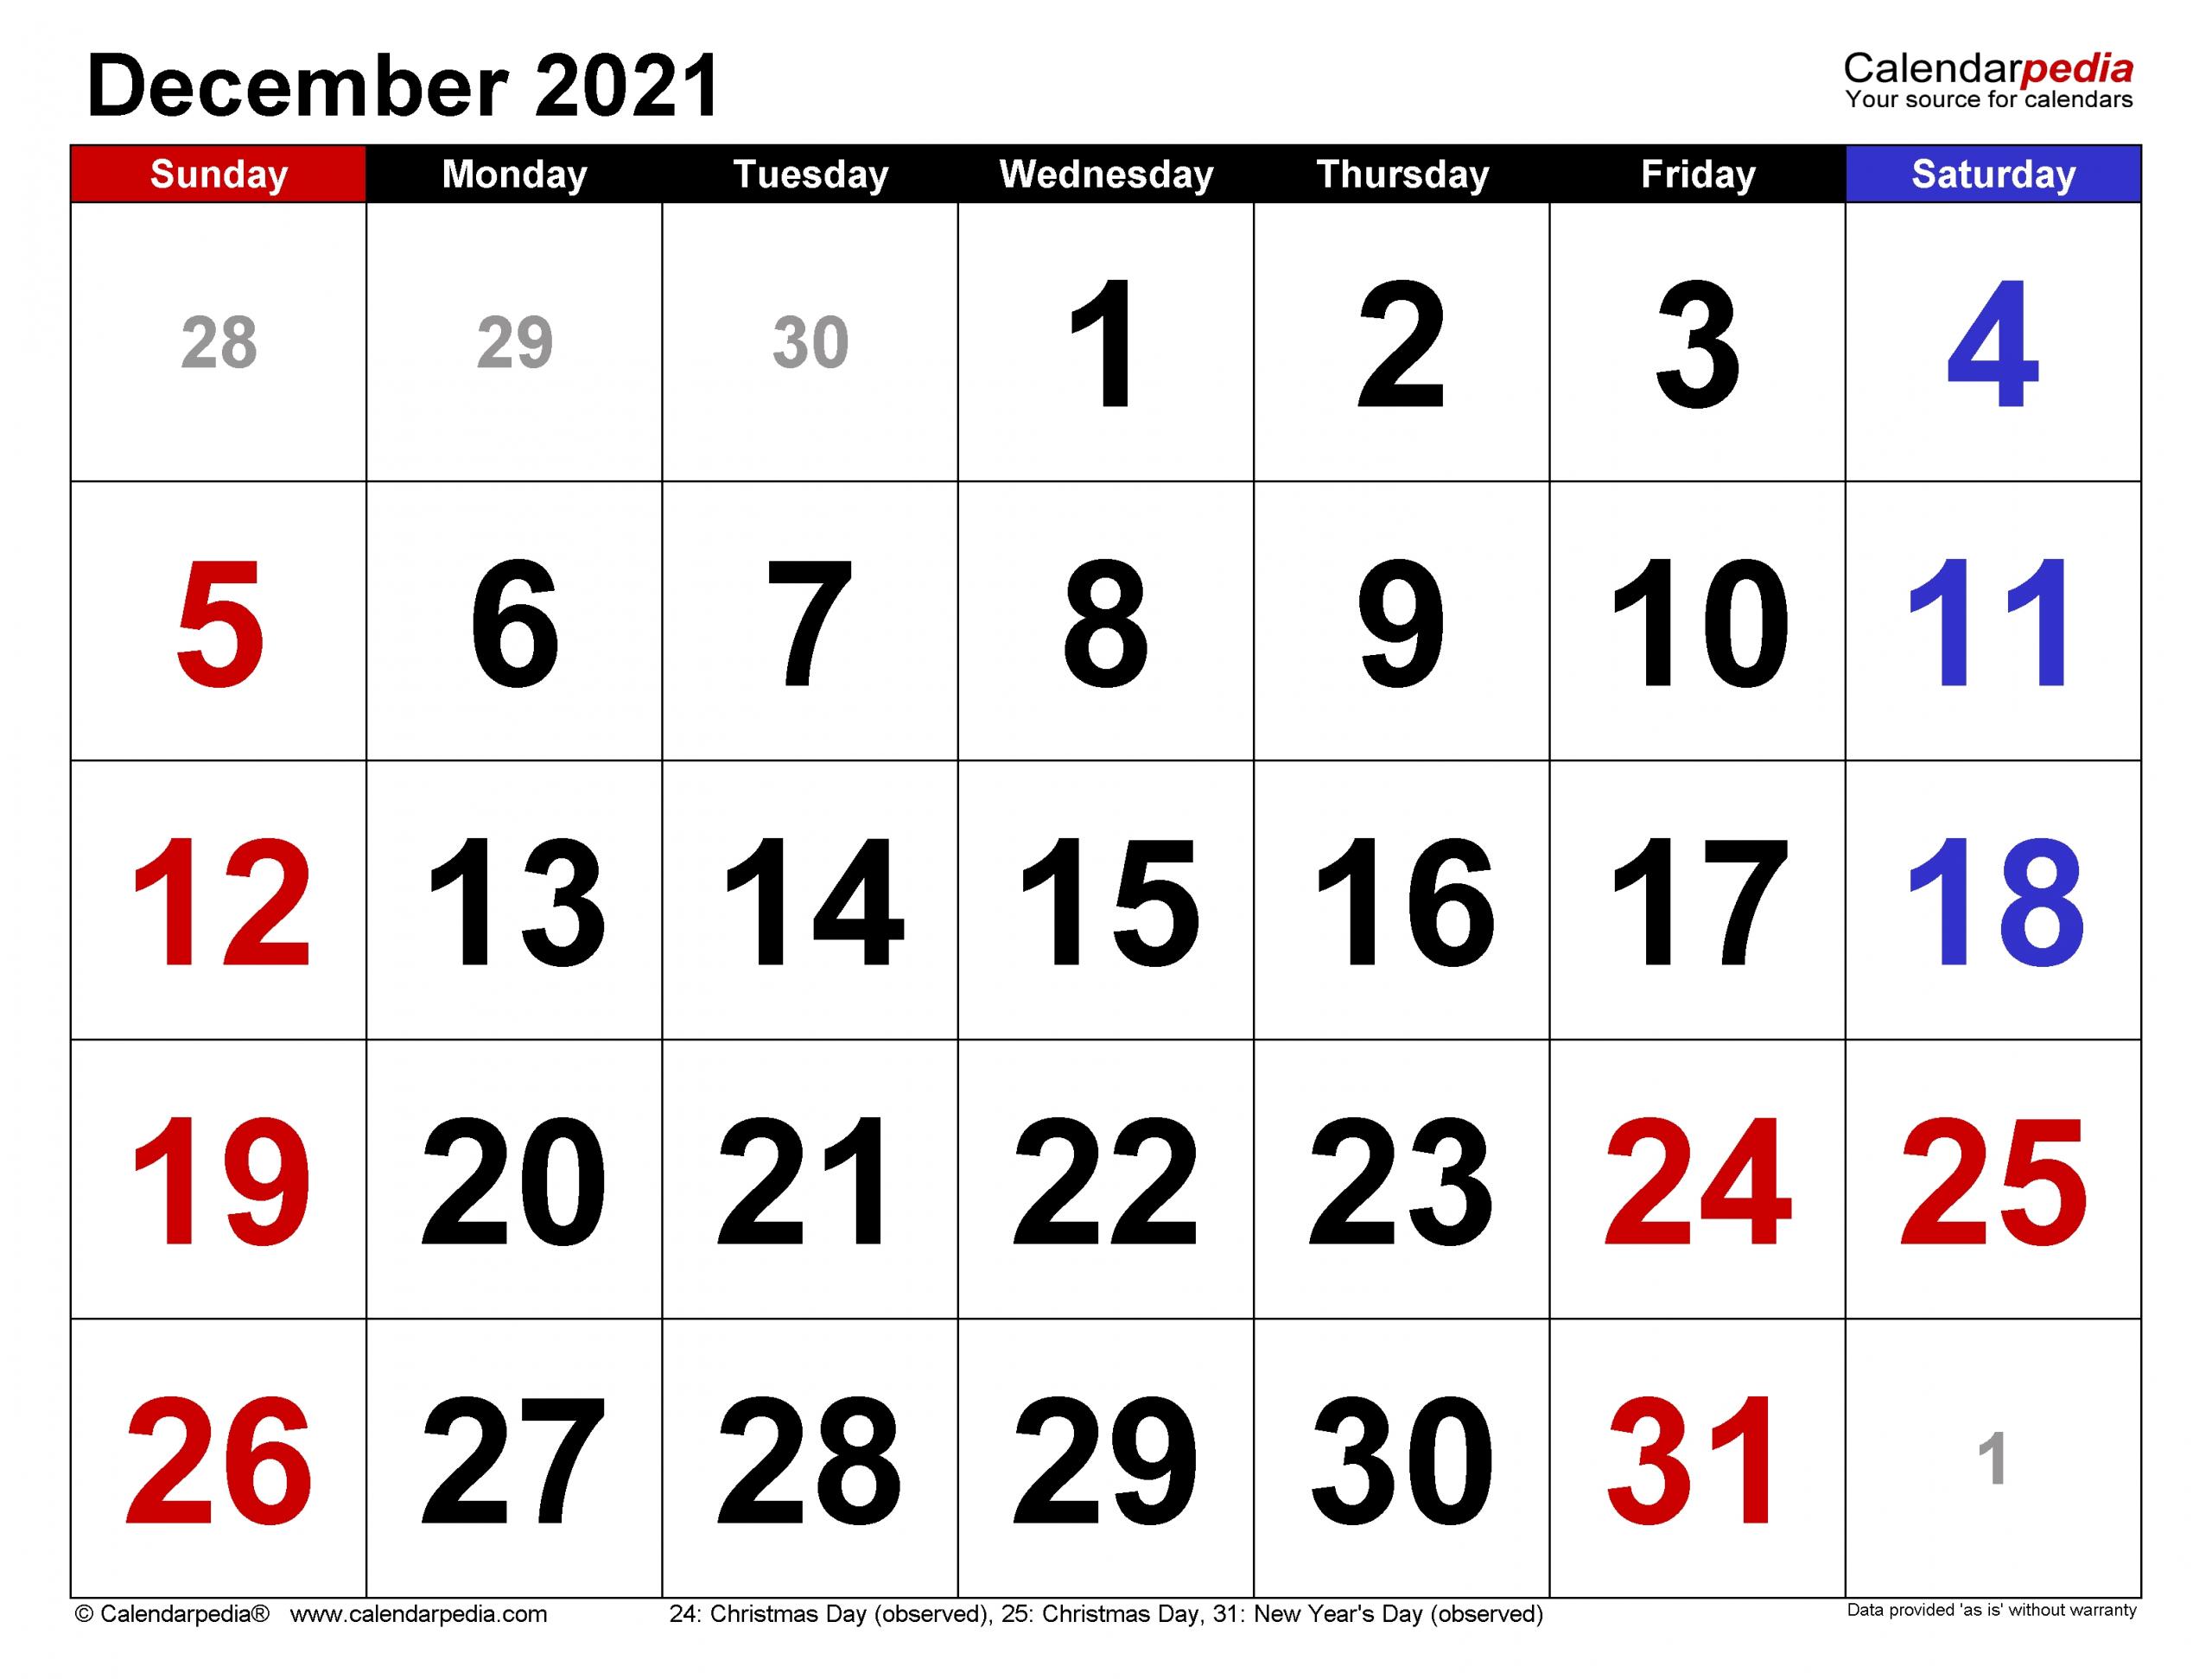 Catch December 2021 Layout